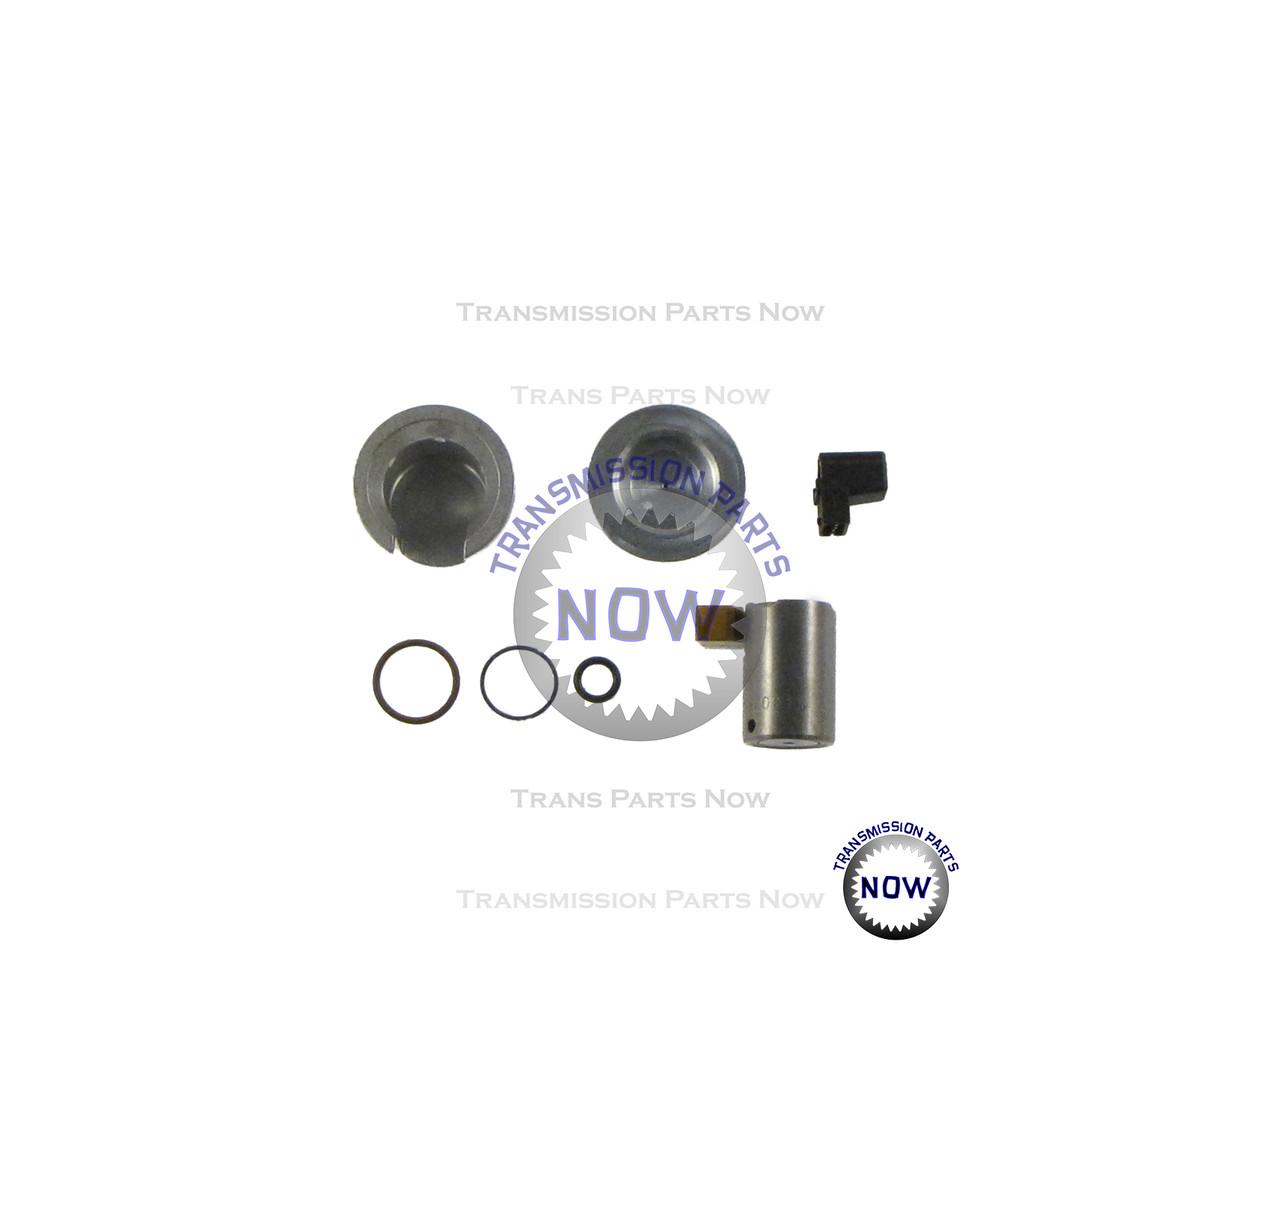 Subaru Transfer Clutch solenoid 4EAT transmission. Rostra